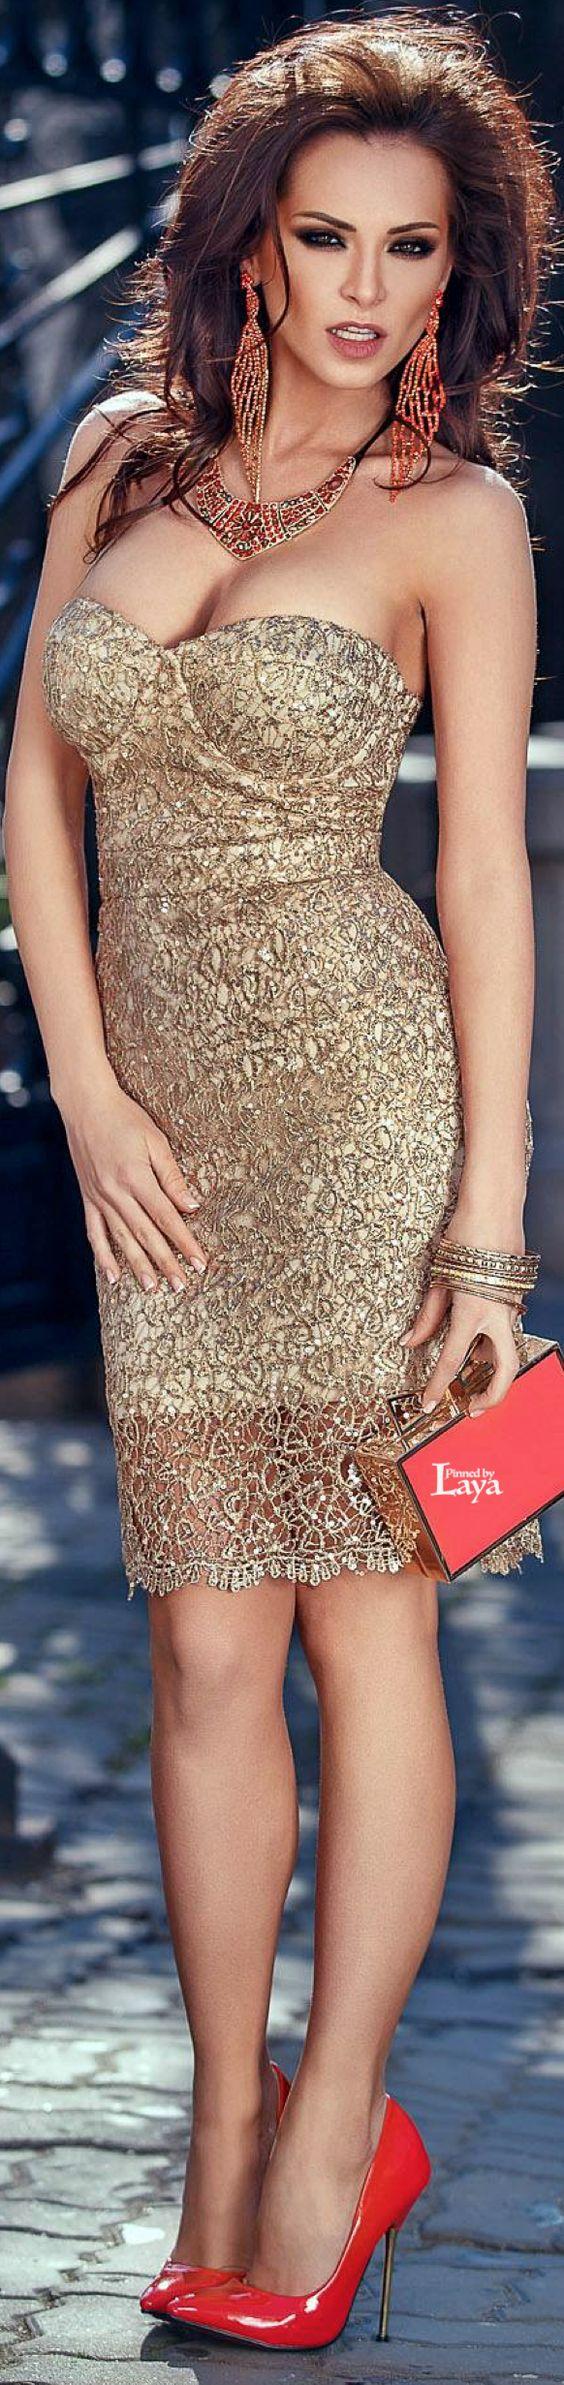 vestidos-dourados-curtos-dicas